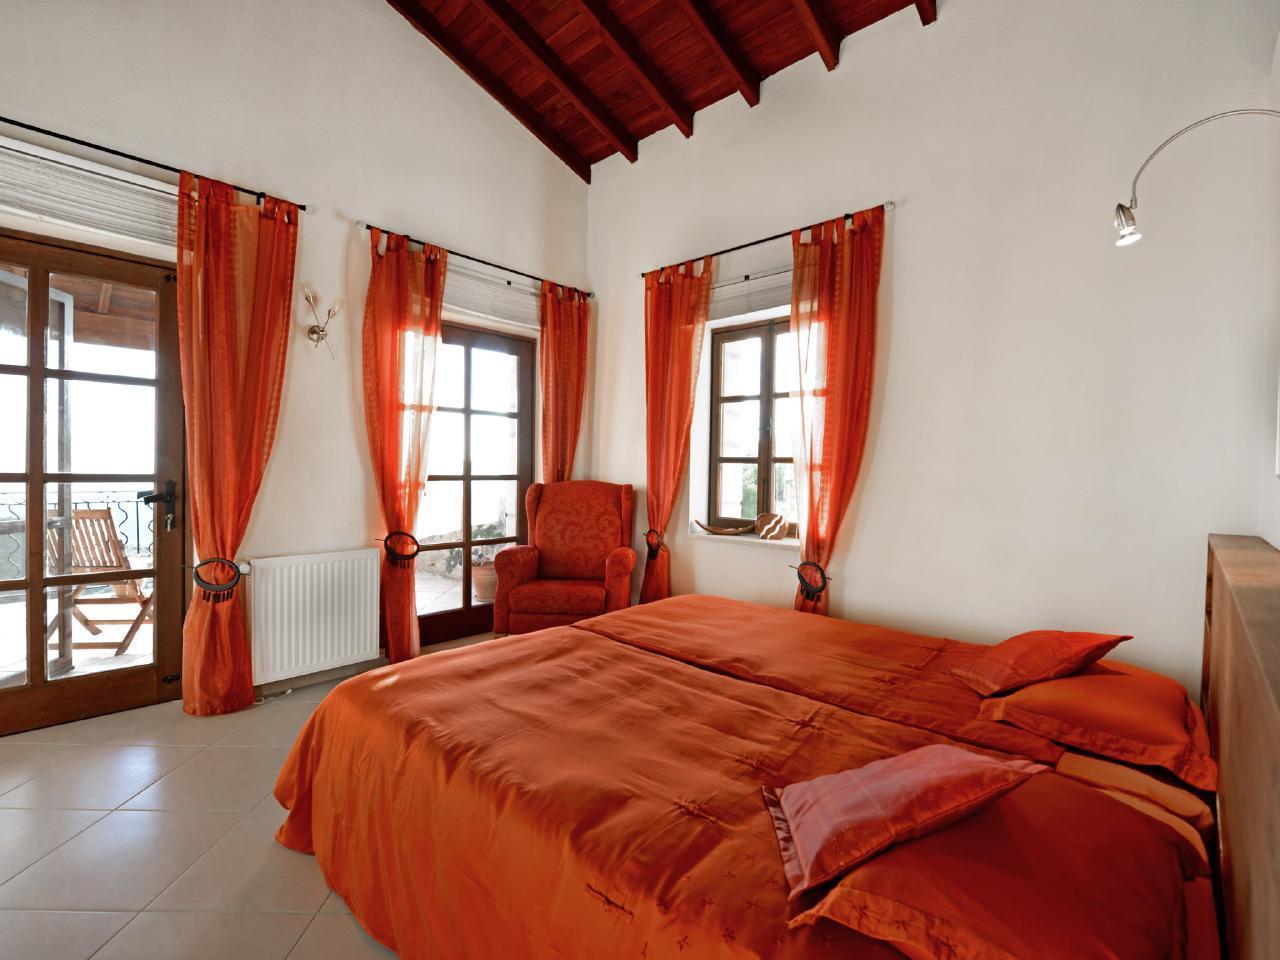 Maison de vacances Exklusives Chalet, romantisch am Berghang und Meer gelegen (2506674), Mesudiye, , Région Egéenne, Turquie, image 21